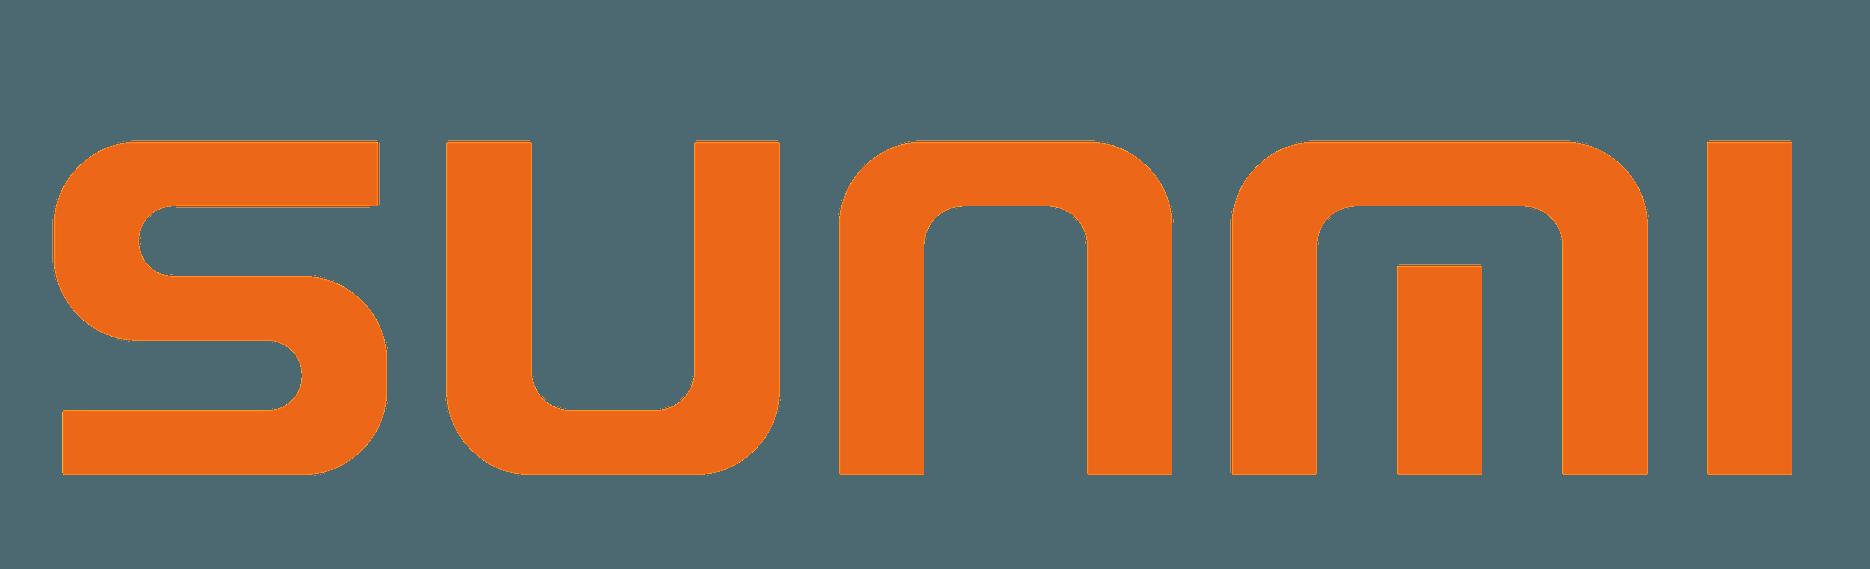 Shanghai Sunmi Technology Co., Ltd